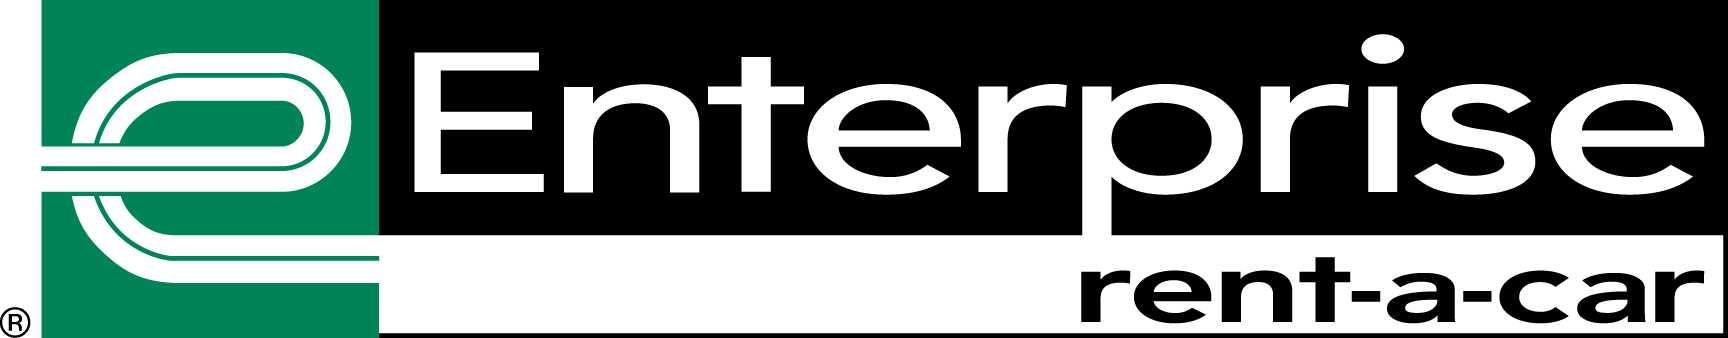 Enterprise rent a car Logos.